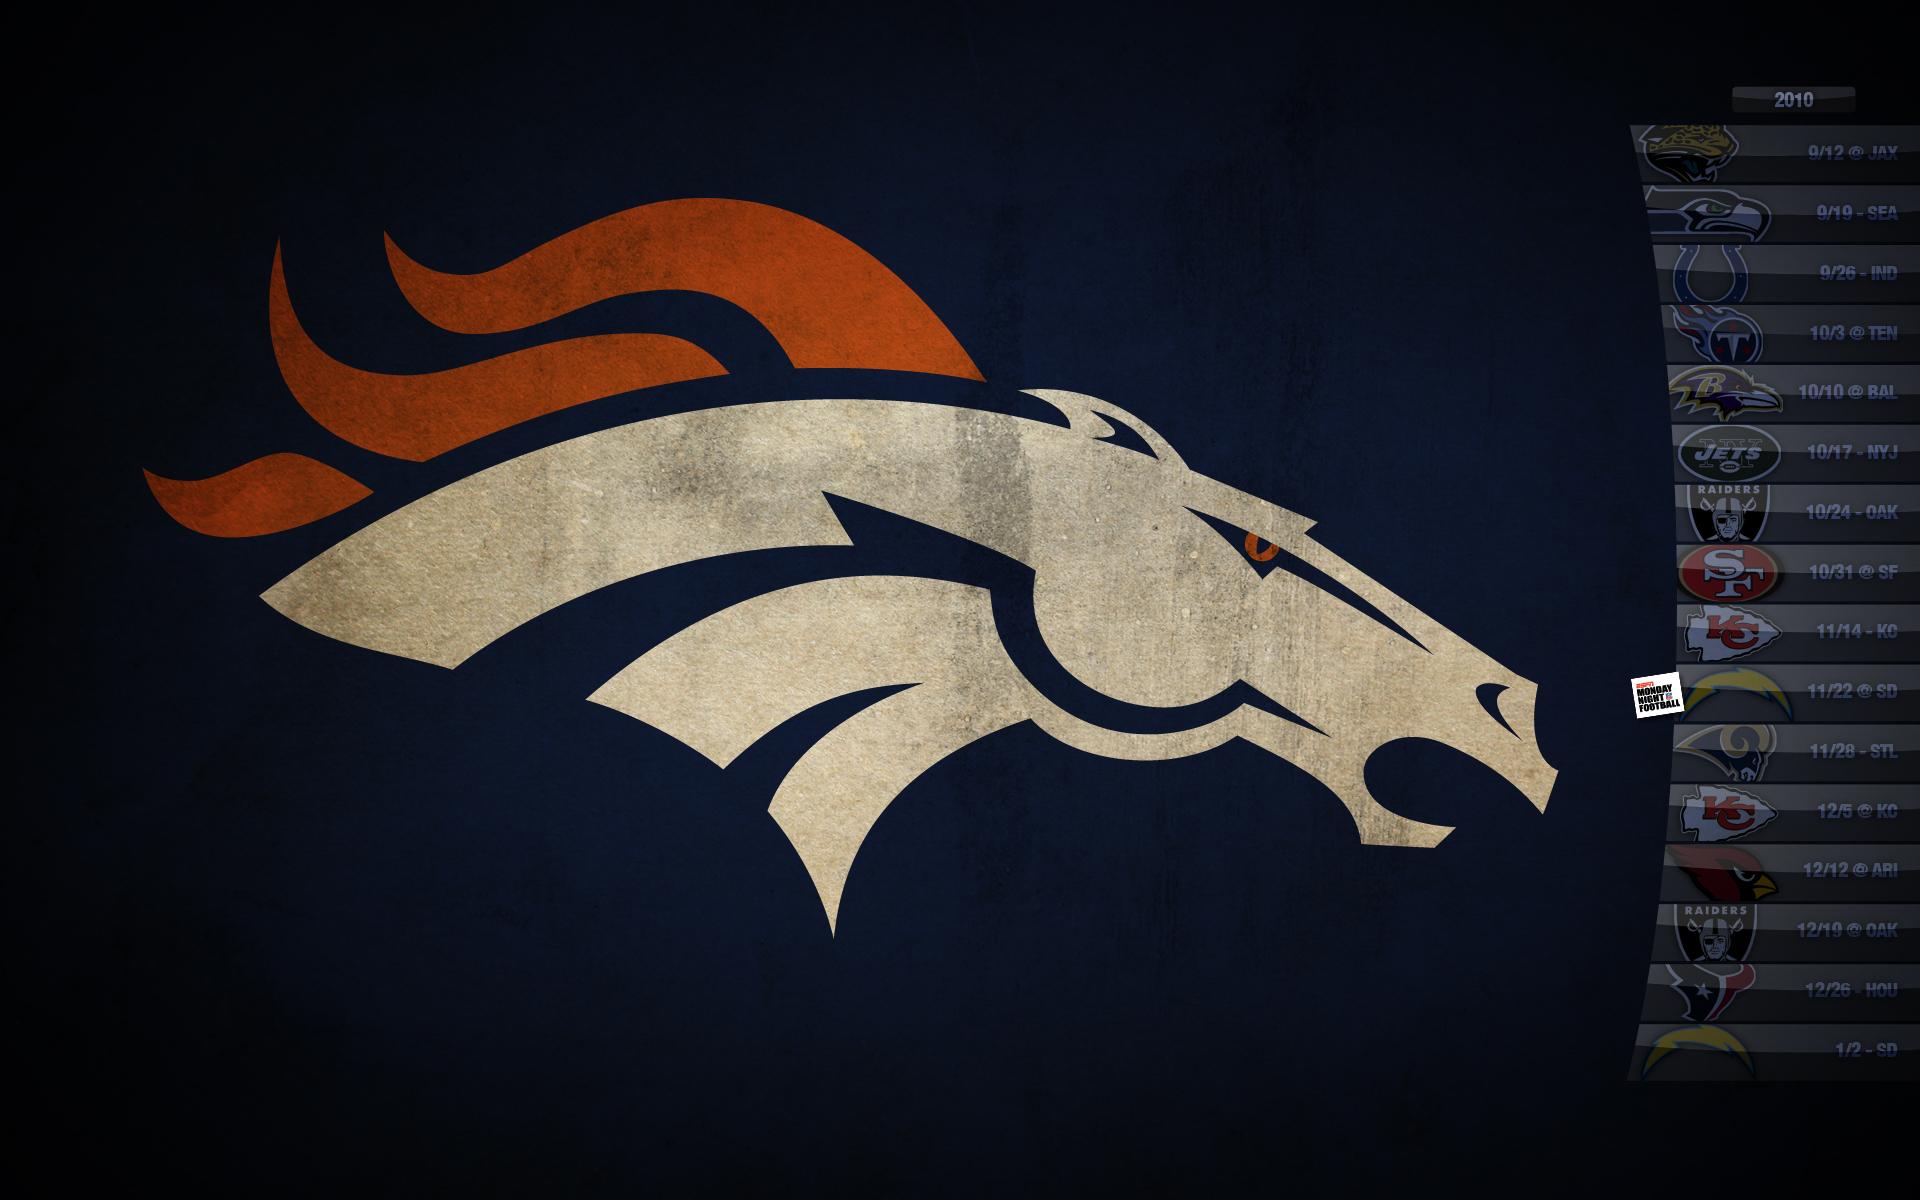 Hd Wallpapers Denver Broncos Vintage Logo 1920 X 1200 890 Kb Jpeg HD 1920x1200